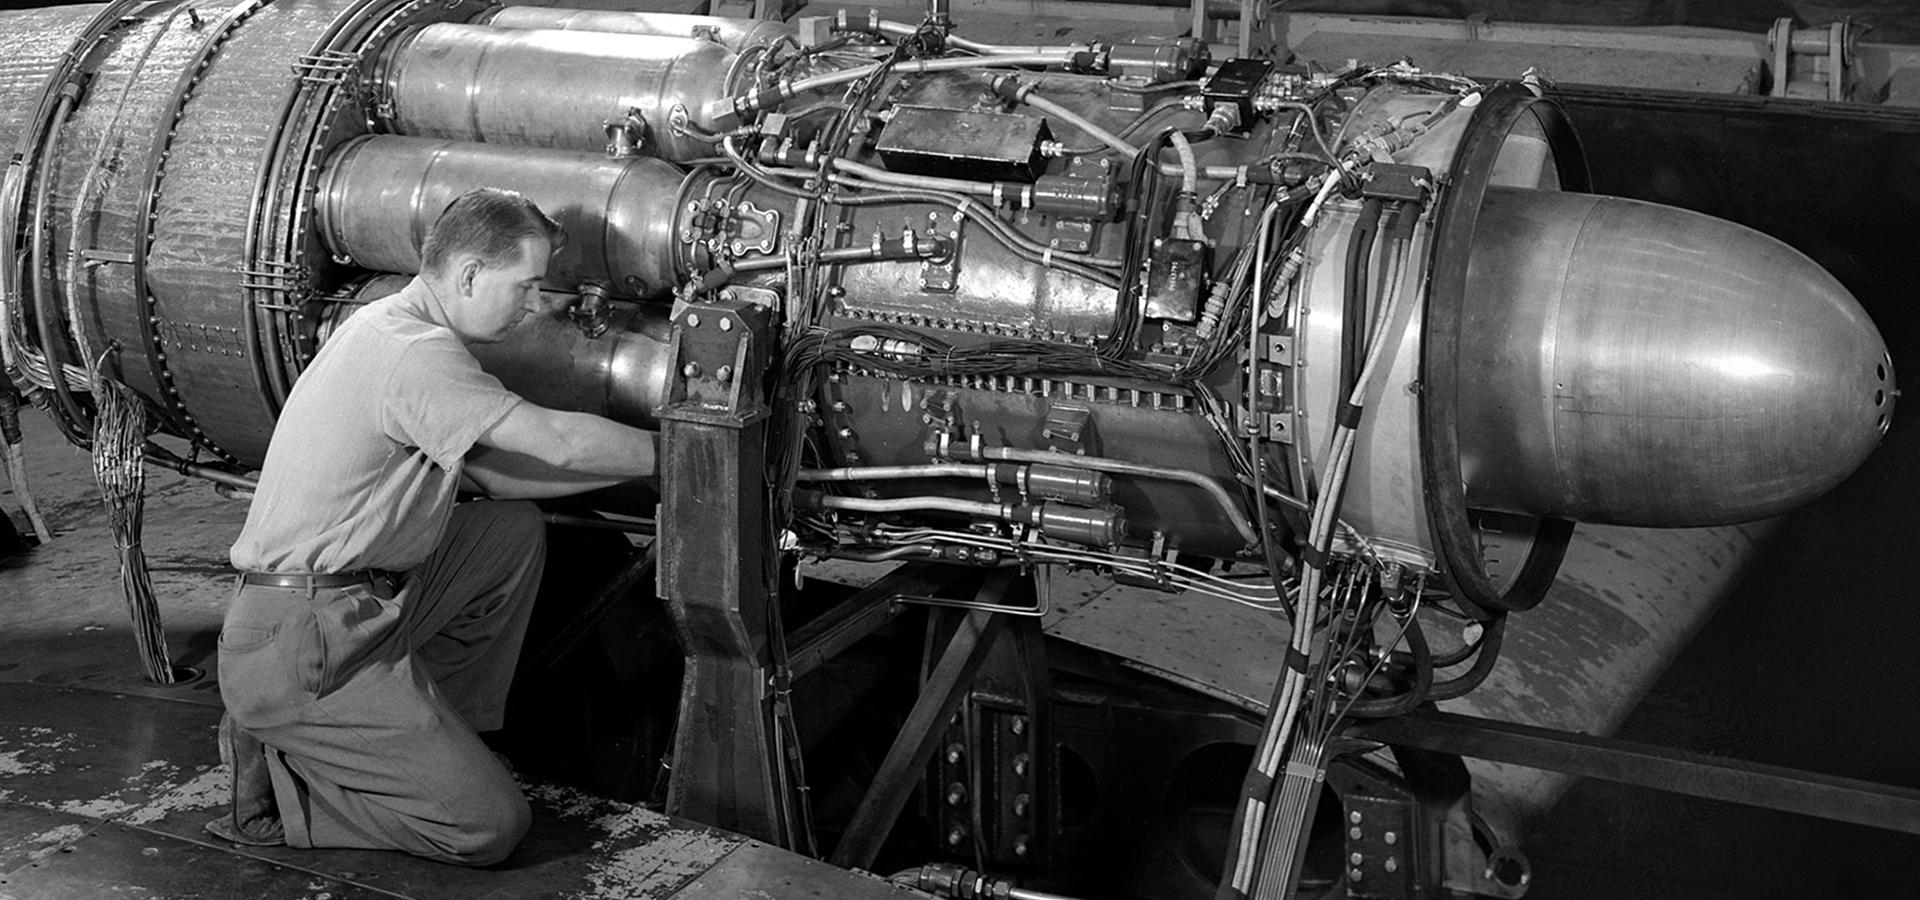 Guy kneeling working on a jet engine